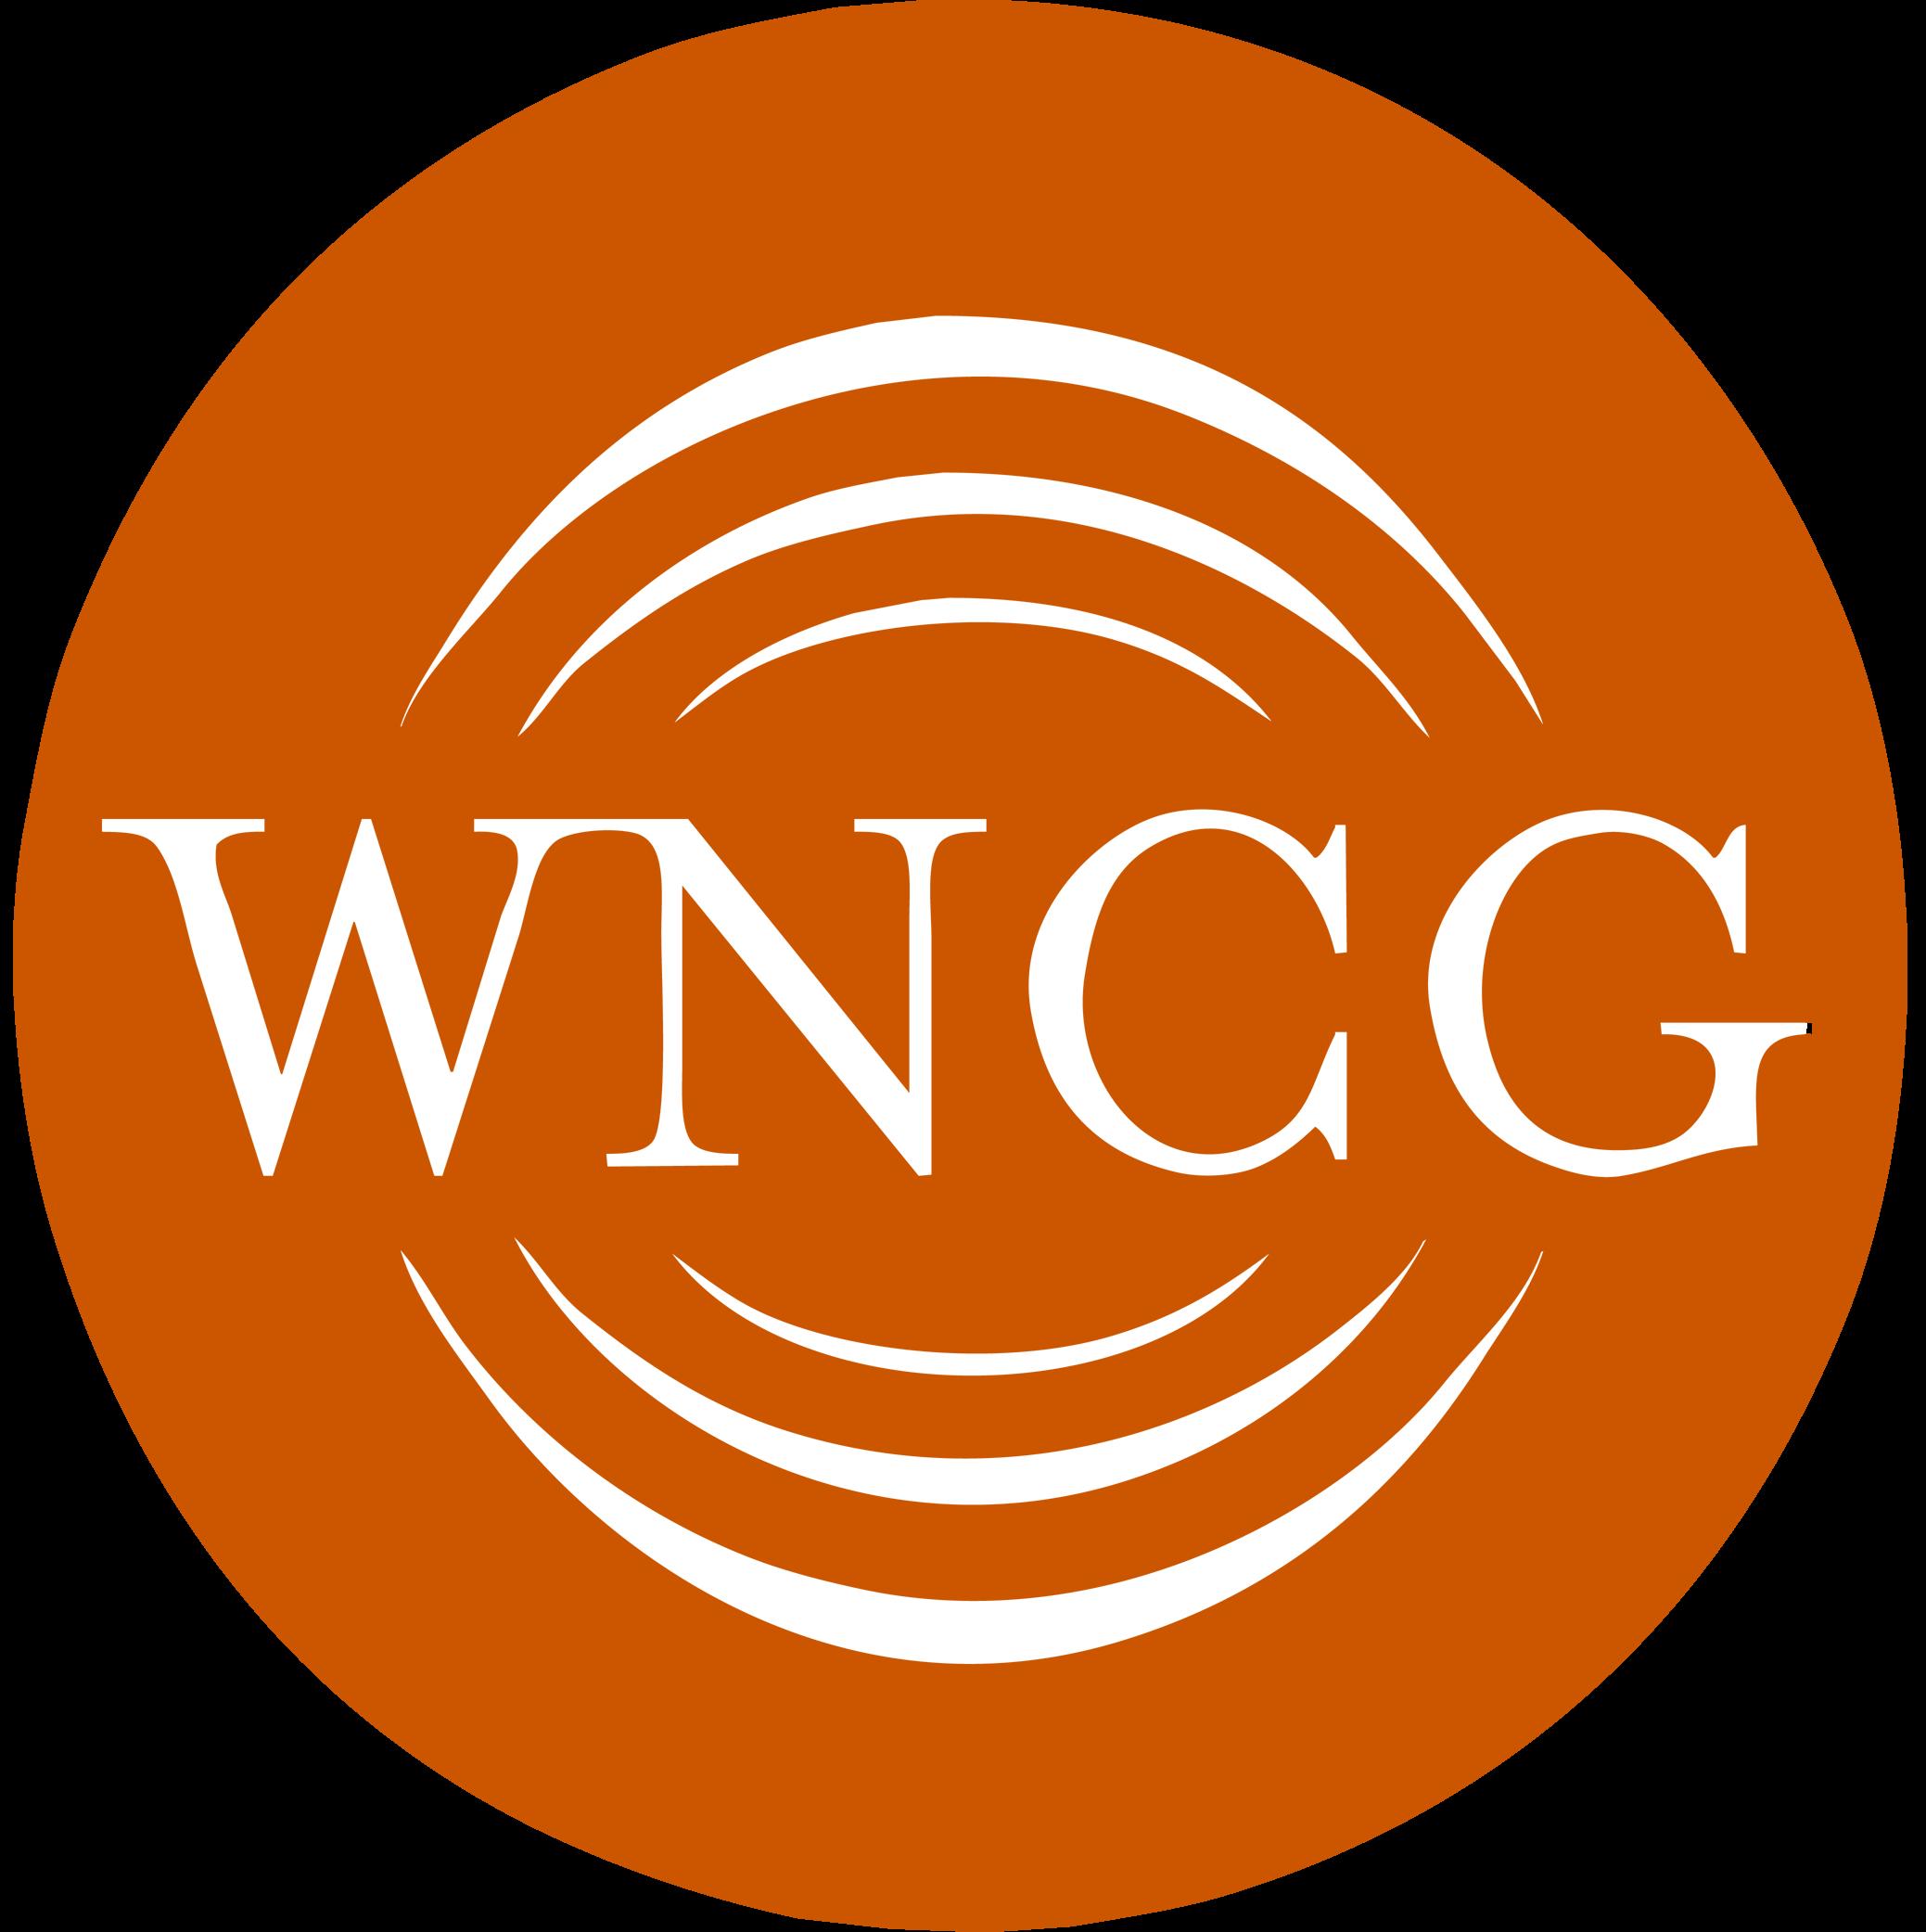 wncg_logo.png#asset:2668